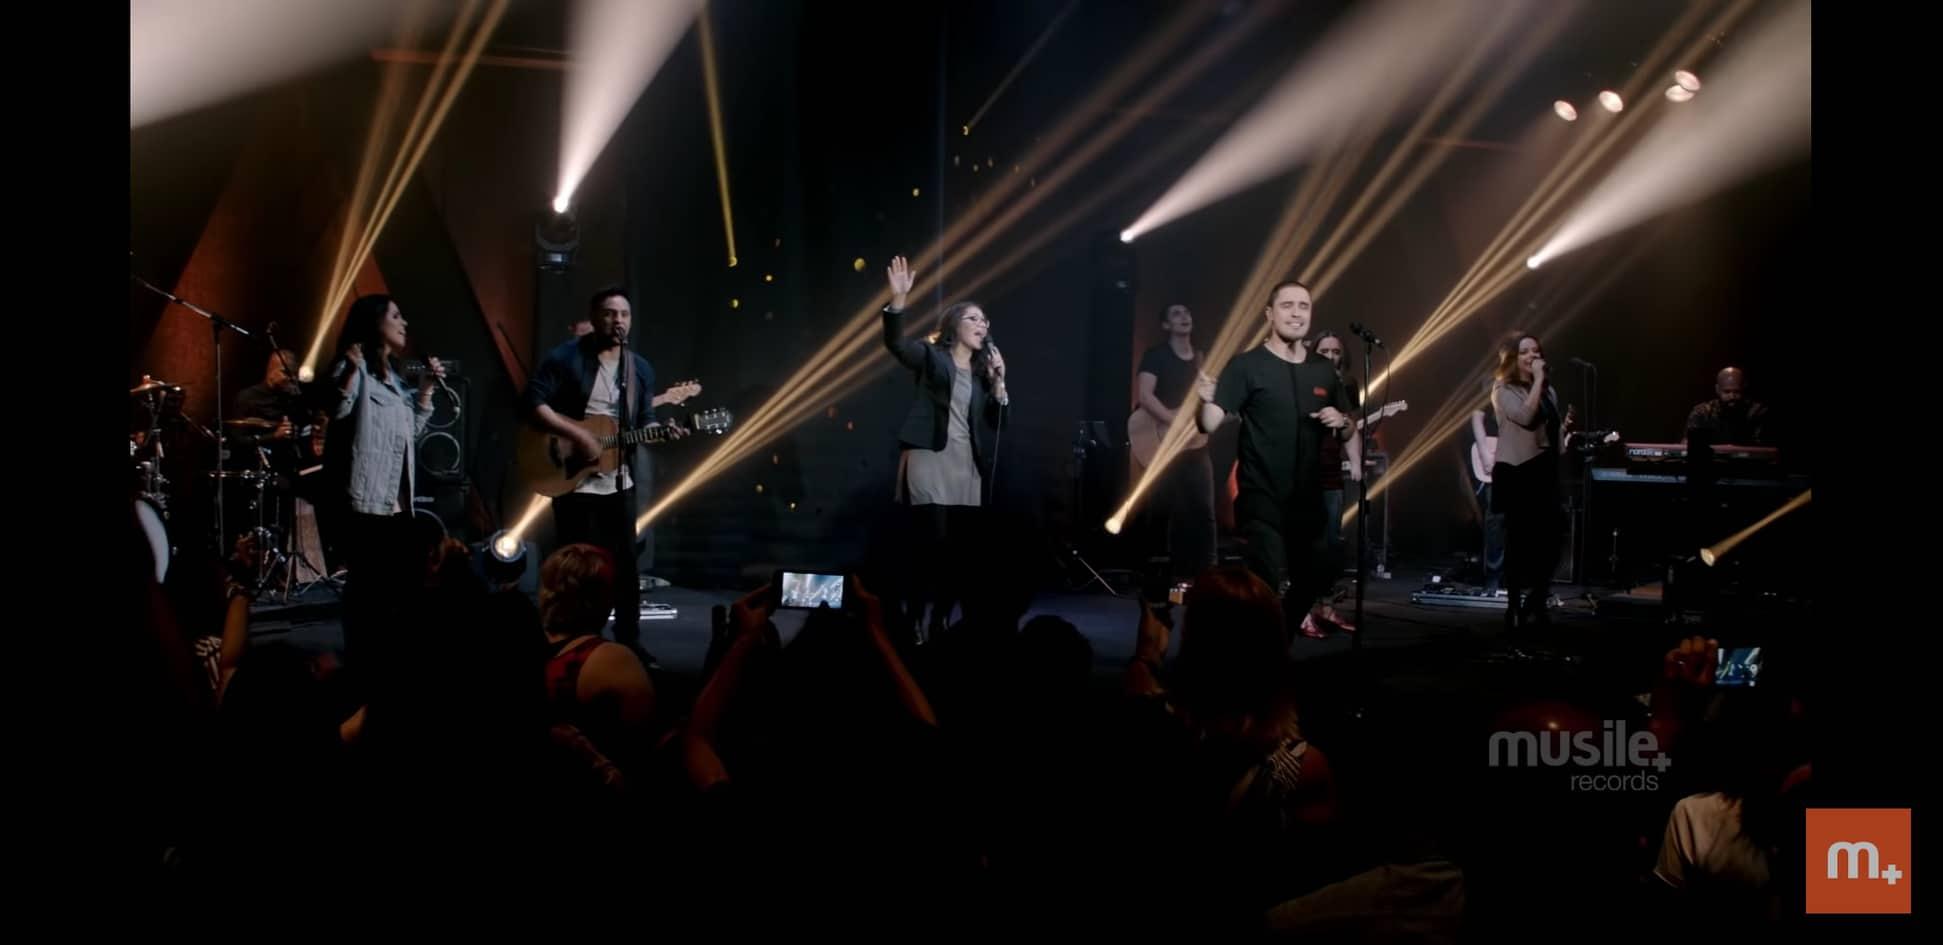 Musile Records | ADAI Music apresenta Aguardo o Dia